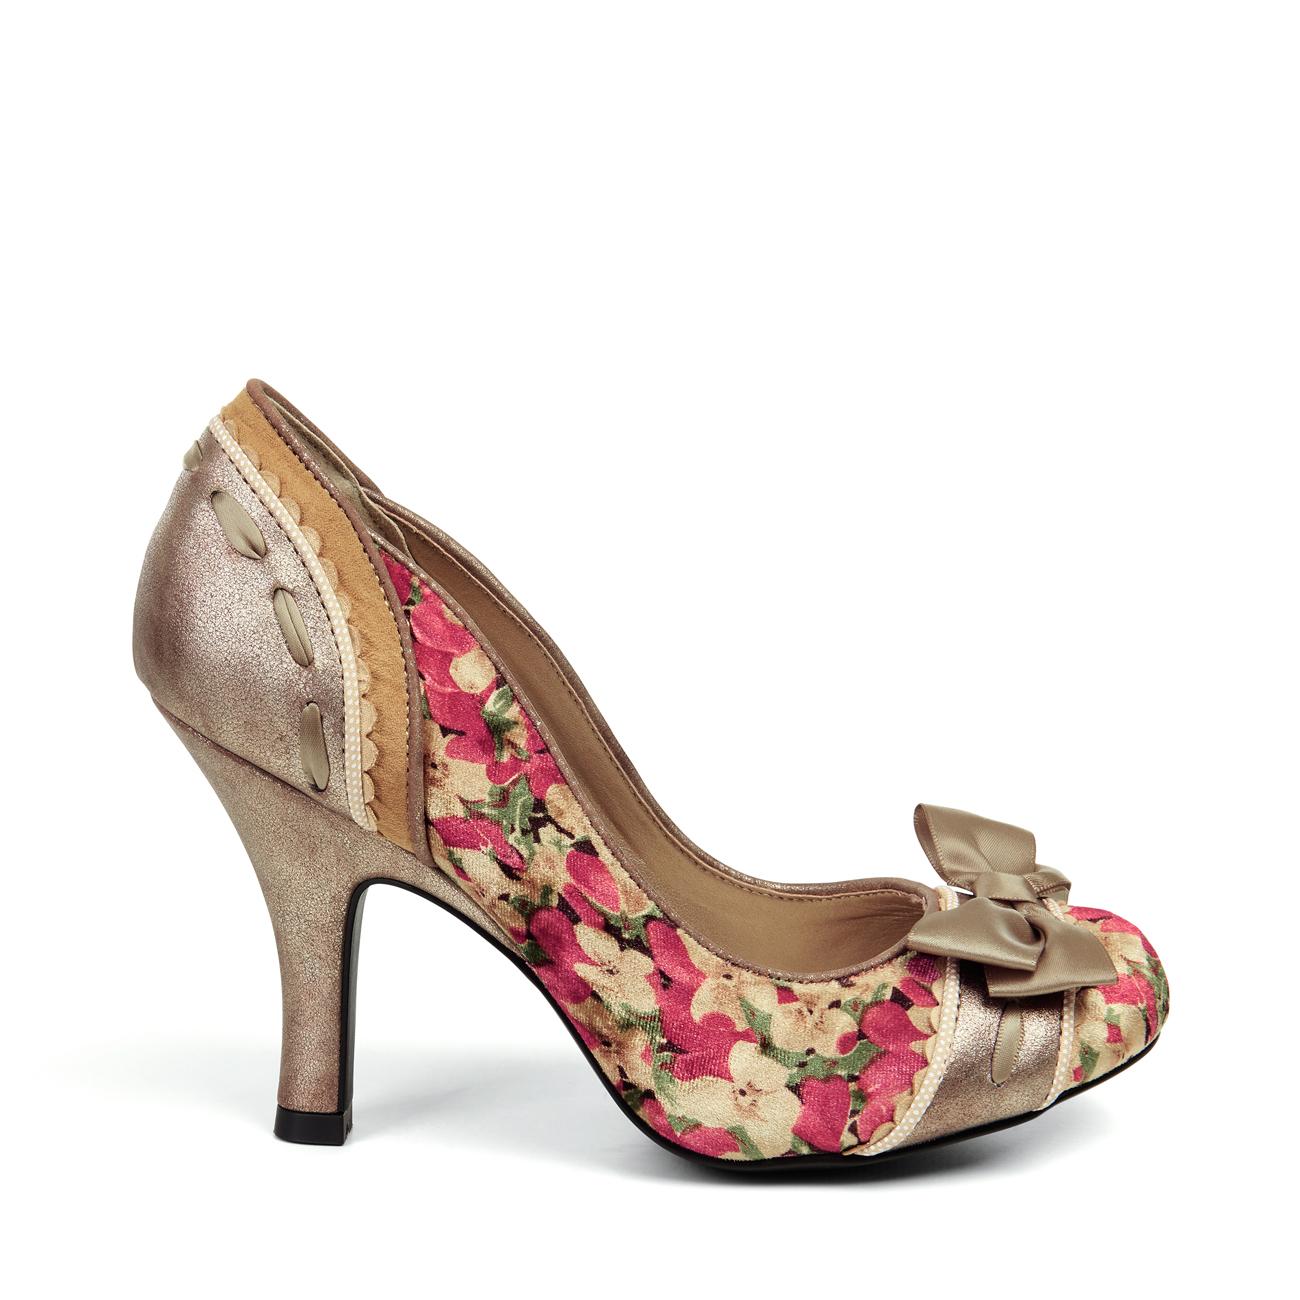 NEW Ruby Shoo Amy Court Schuhe / Round Toe Navy Spot / Schuhe Cream UK3-9 EU36-42 Bridal f45545